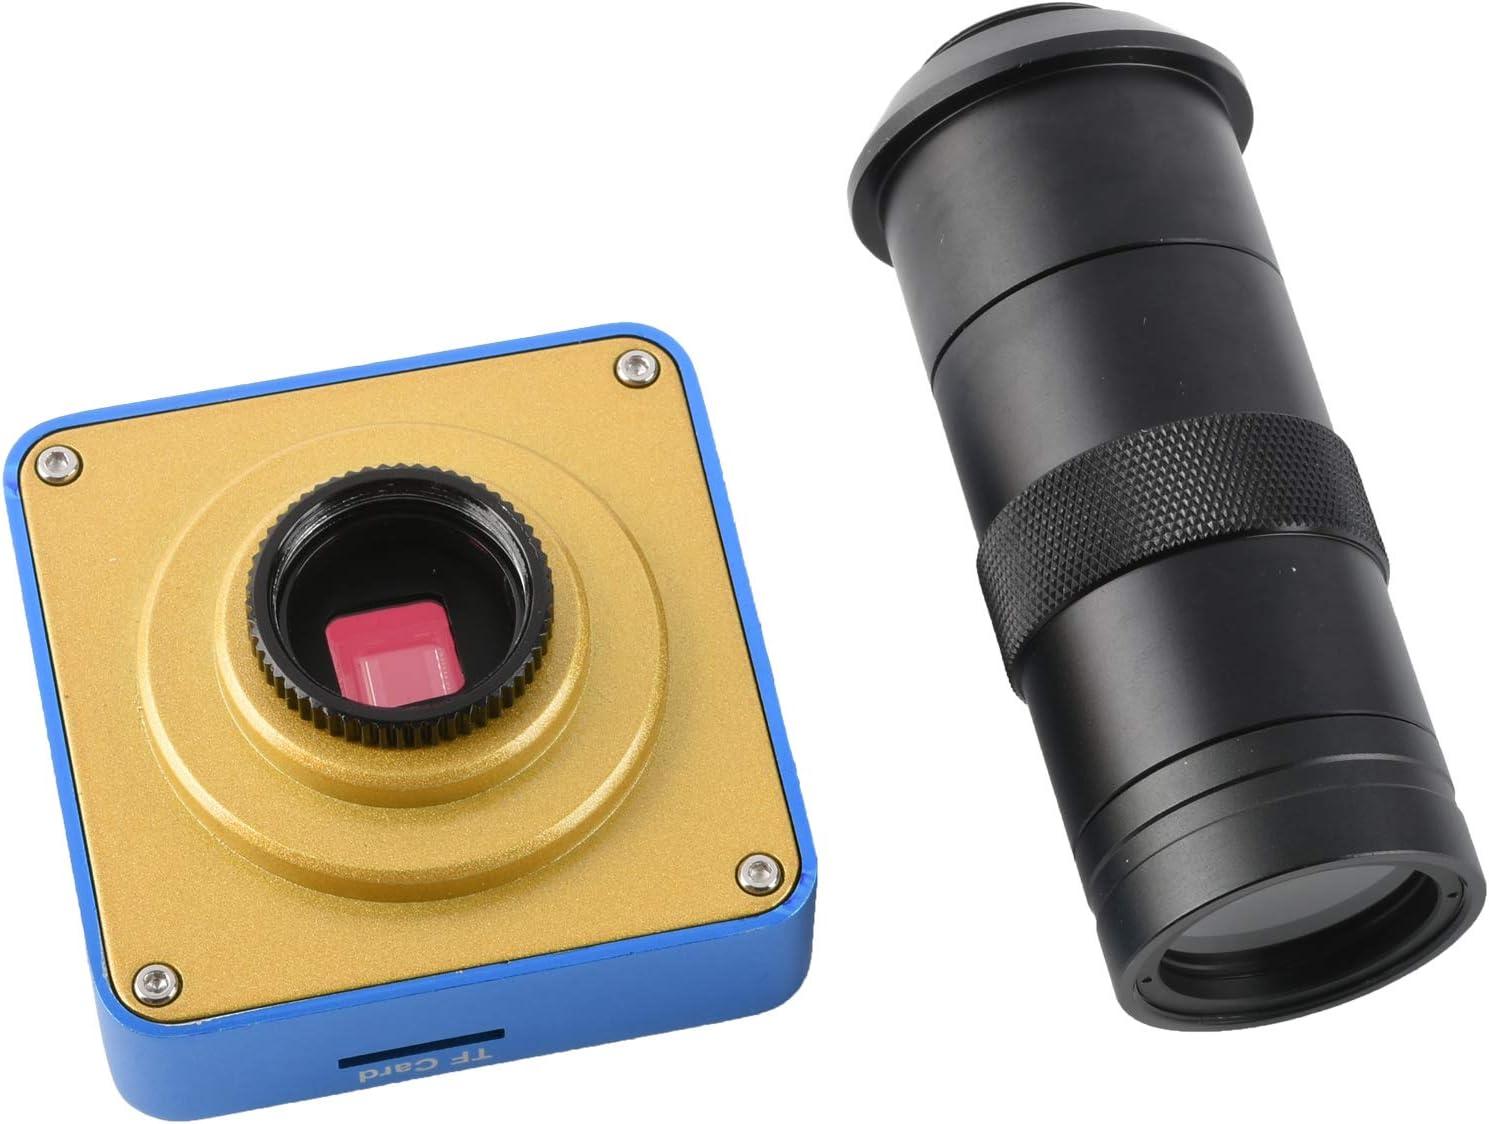 Jeanoko Industrial Microscope Camera Stable Performance 38MP Microscope Camera for Industry